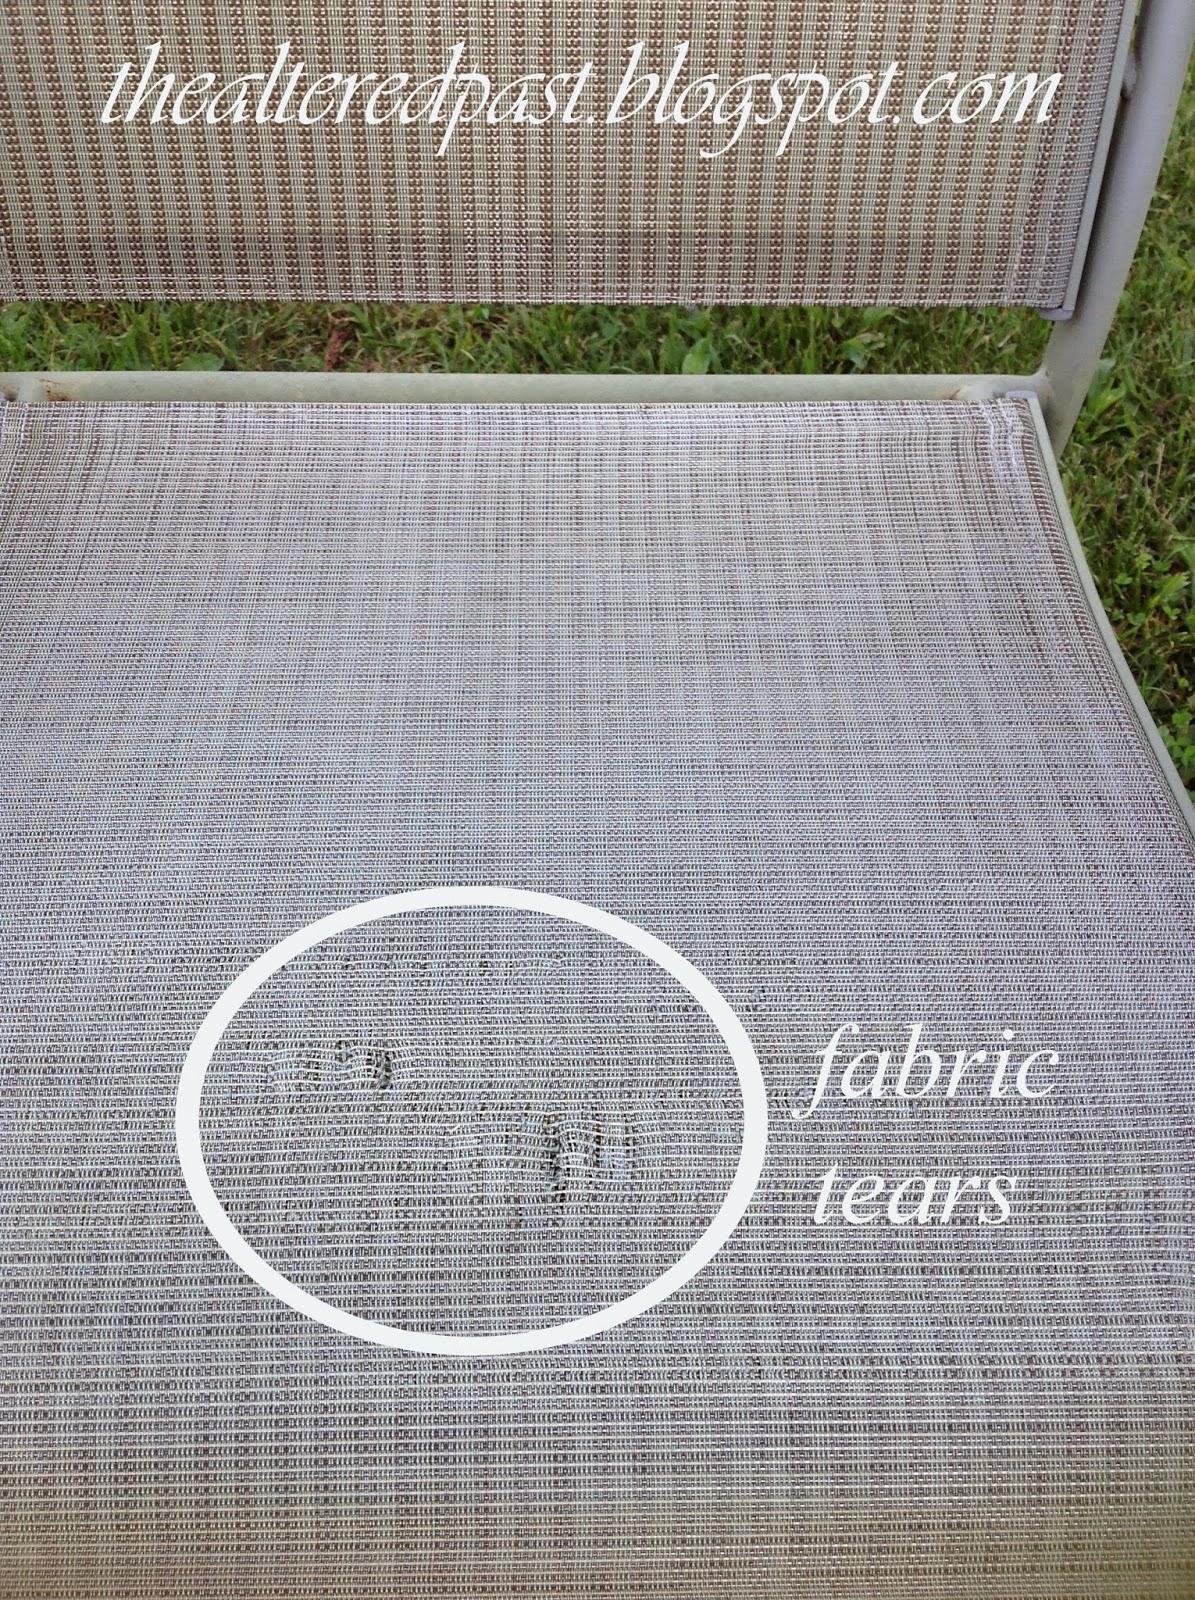 Redo Sling Patio Chairs Lounge Chair Beach Towel Clips Spain Hill Farm Set